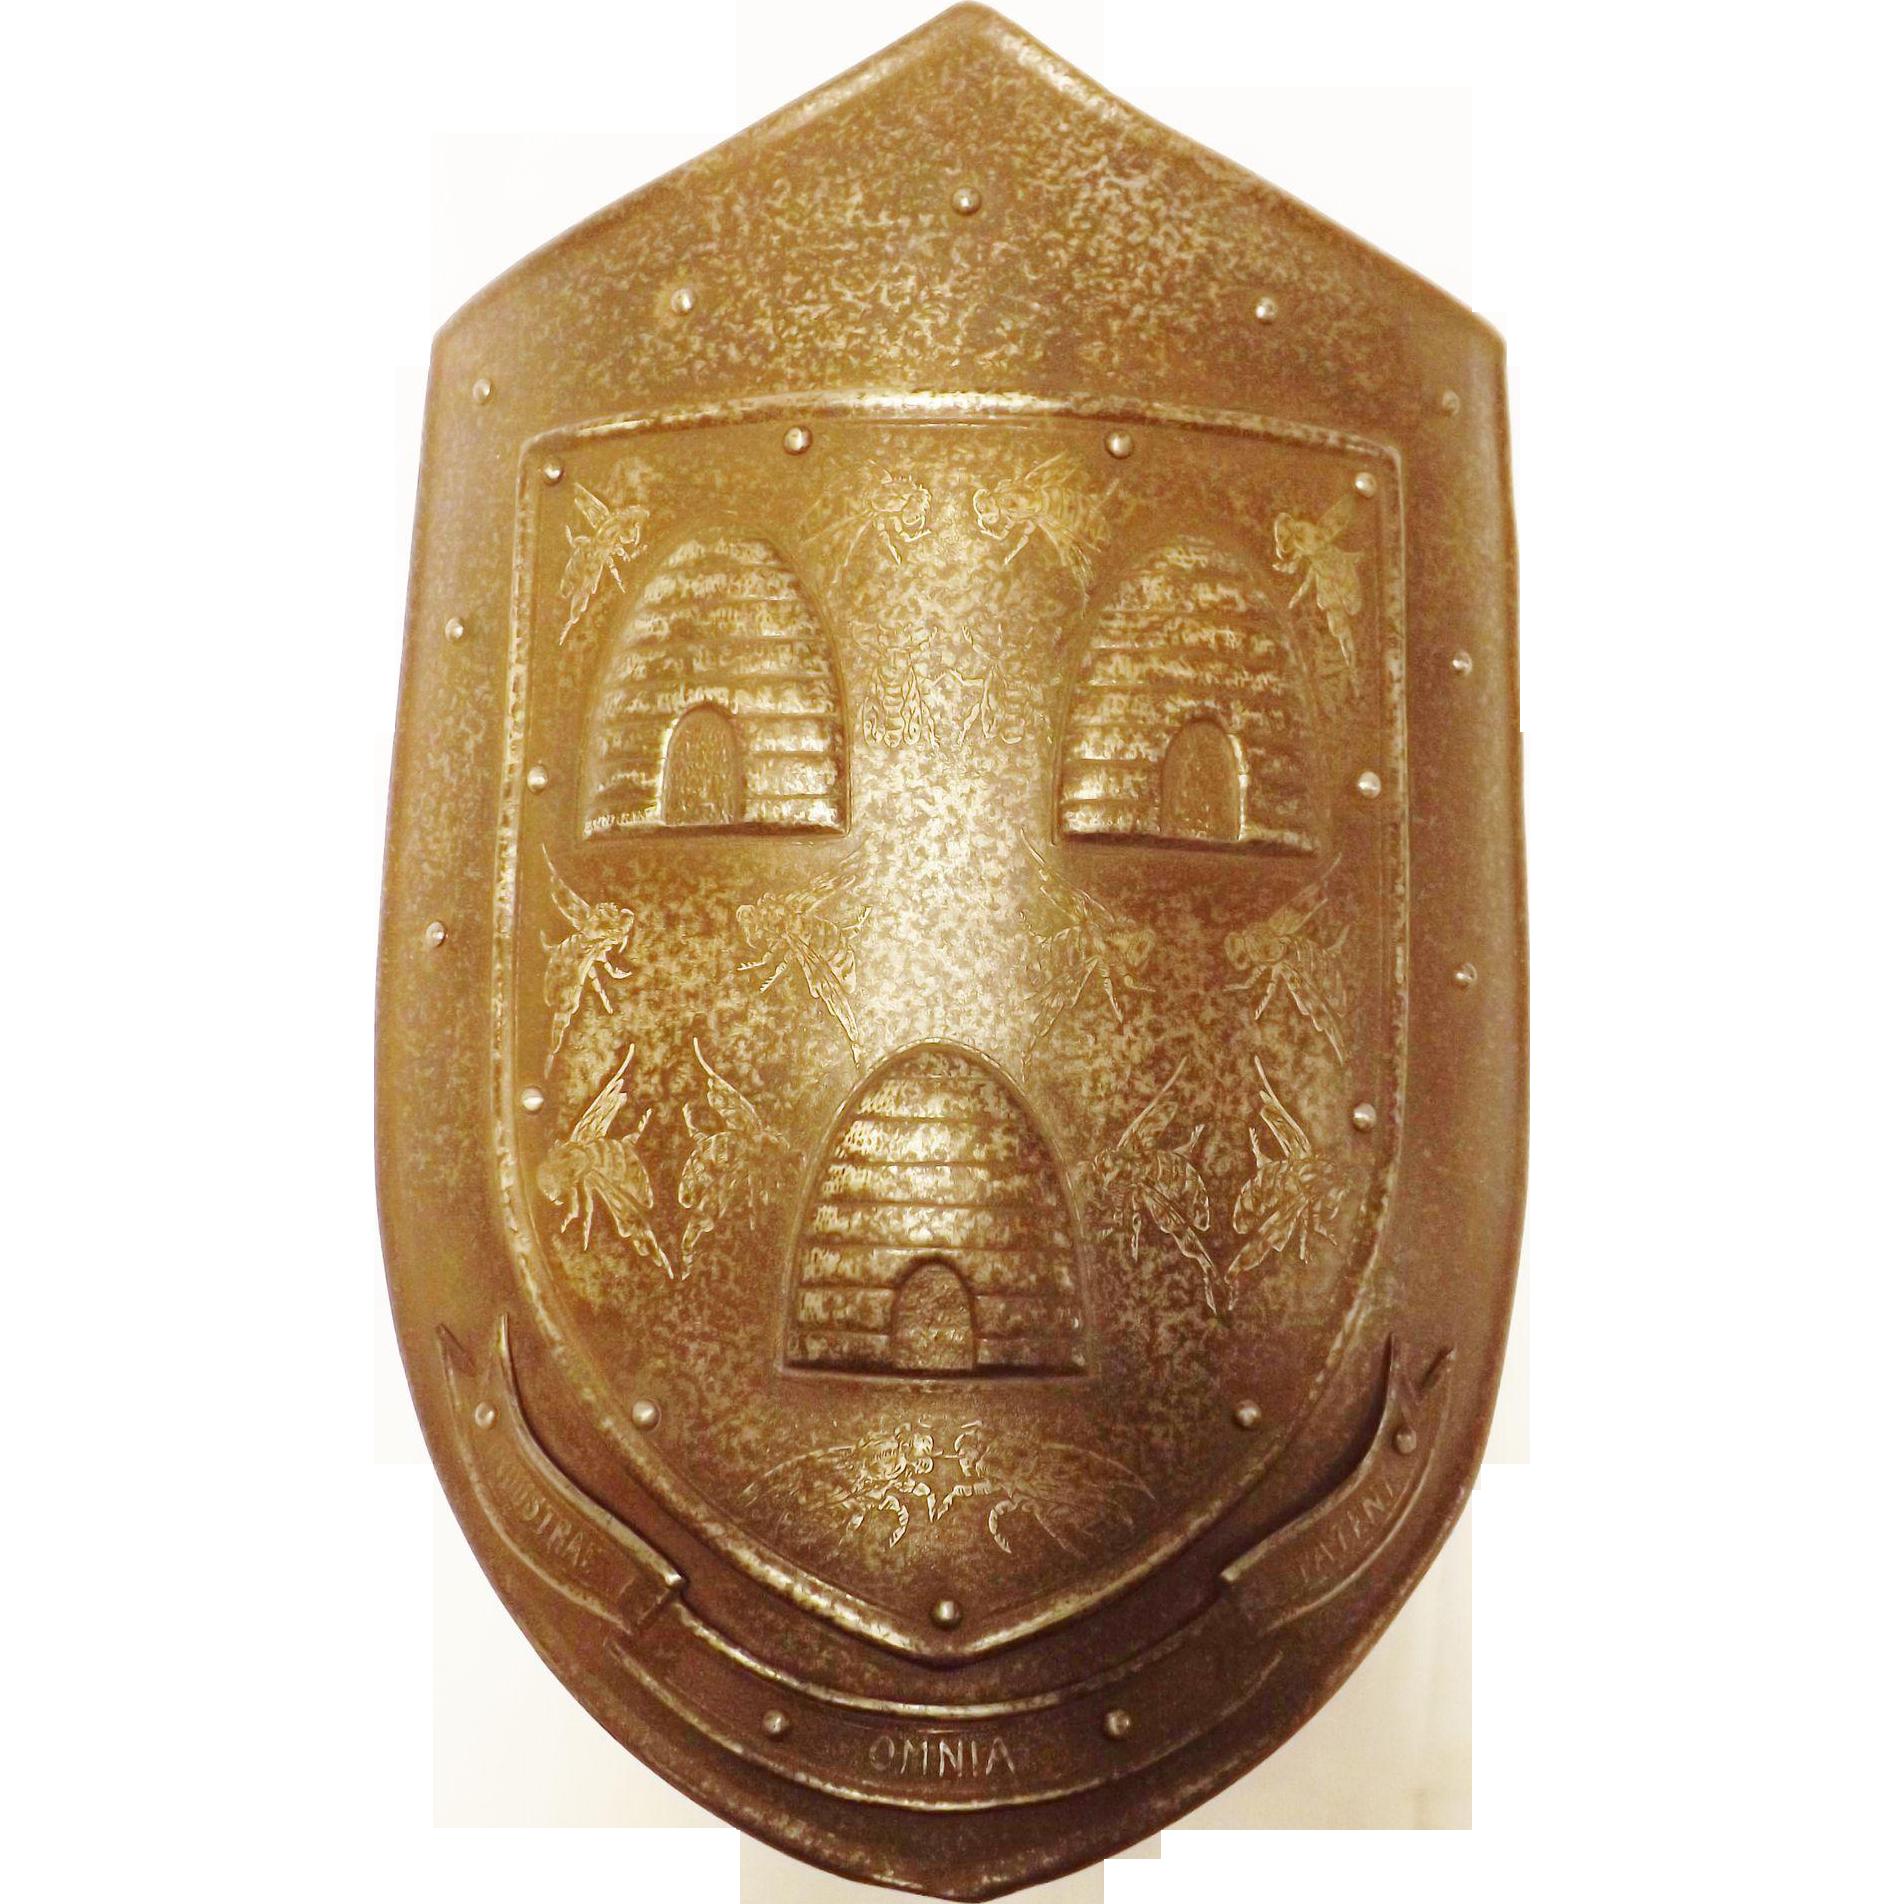 A Steel Heralidic Shield